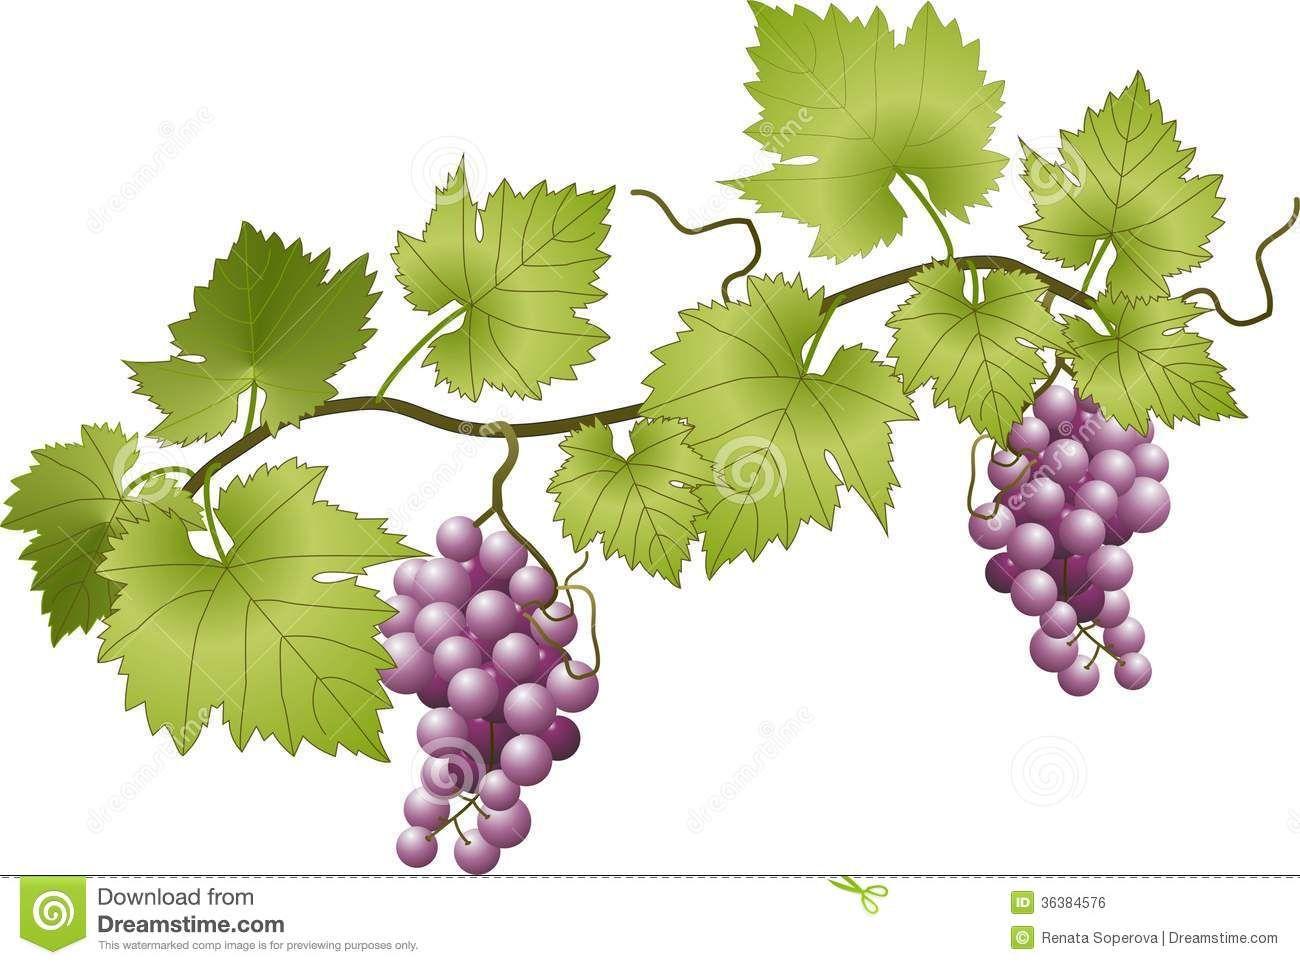 images of grape vines - photo #43